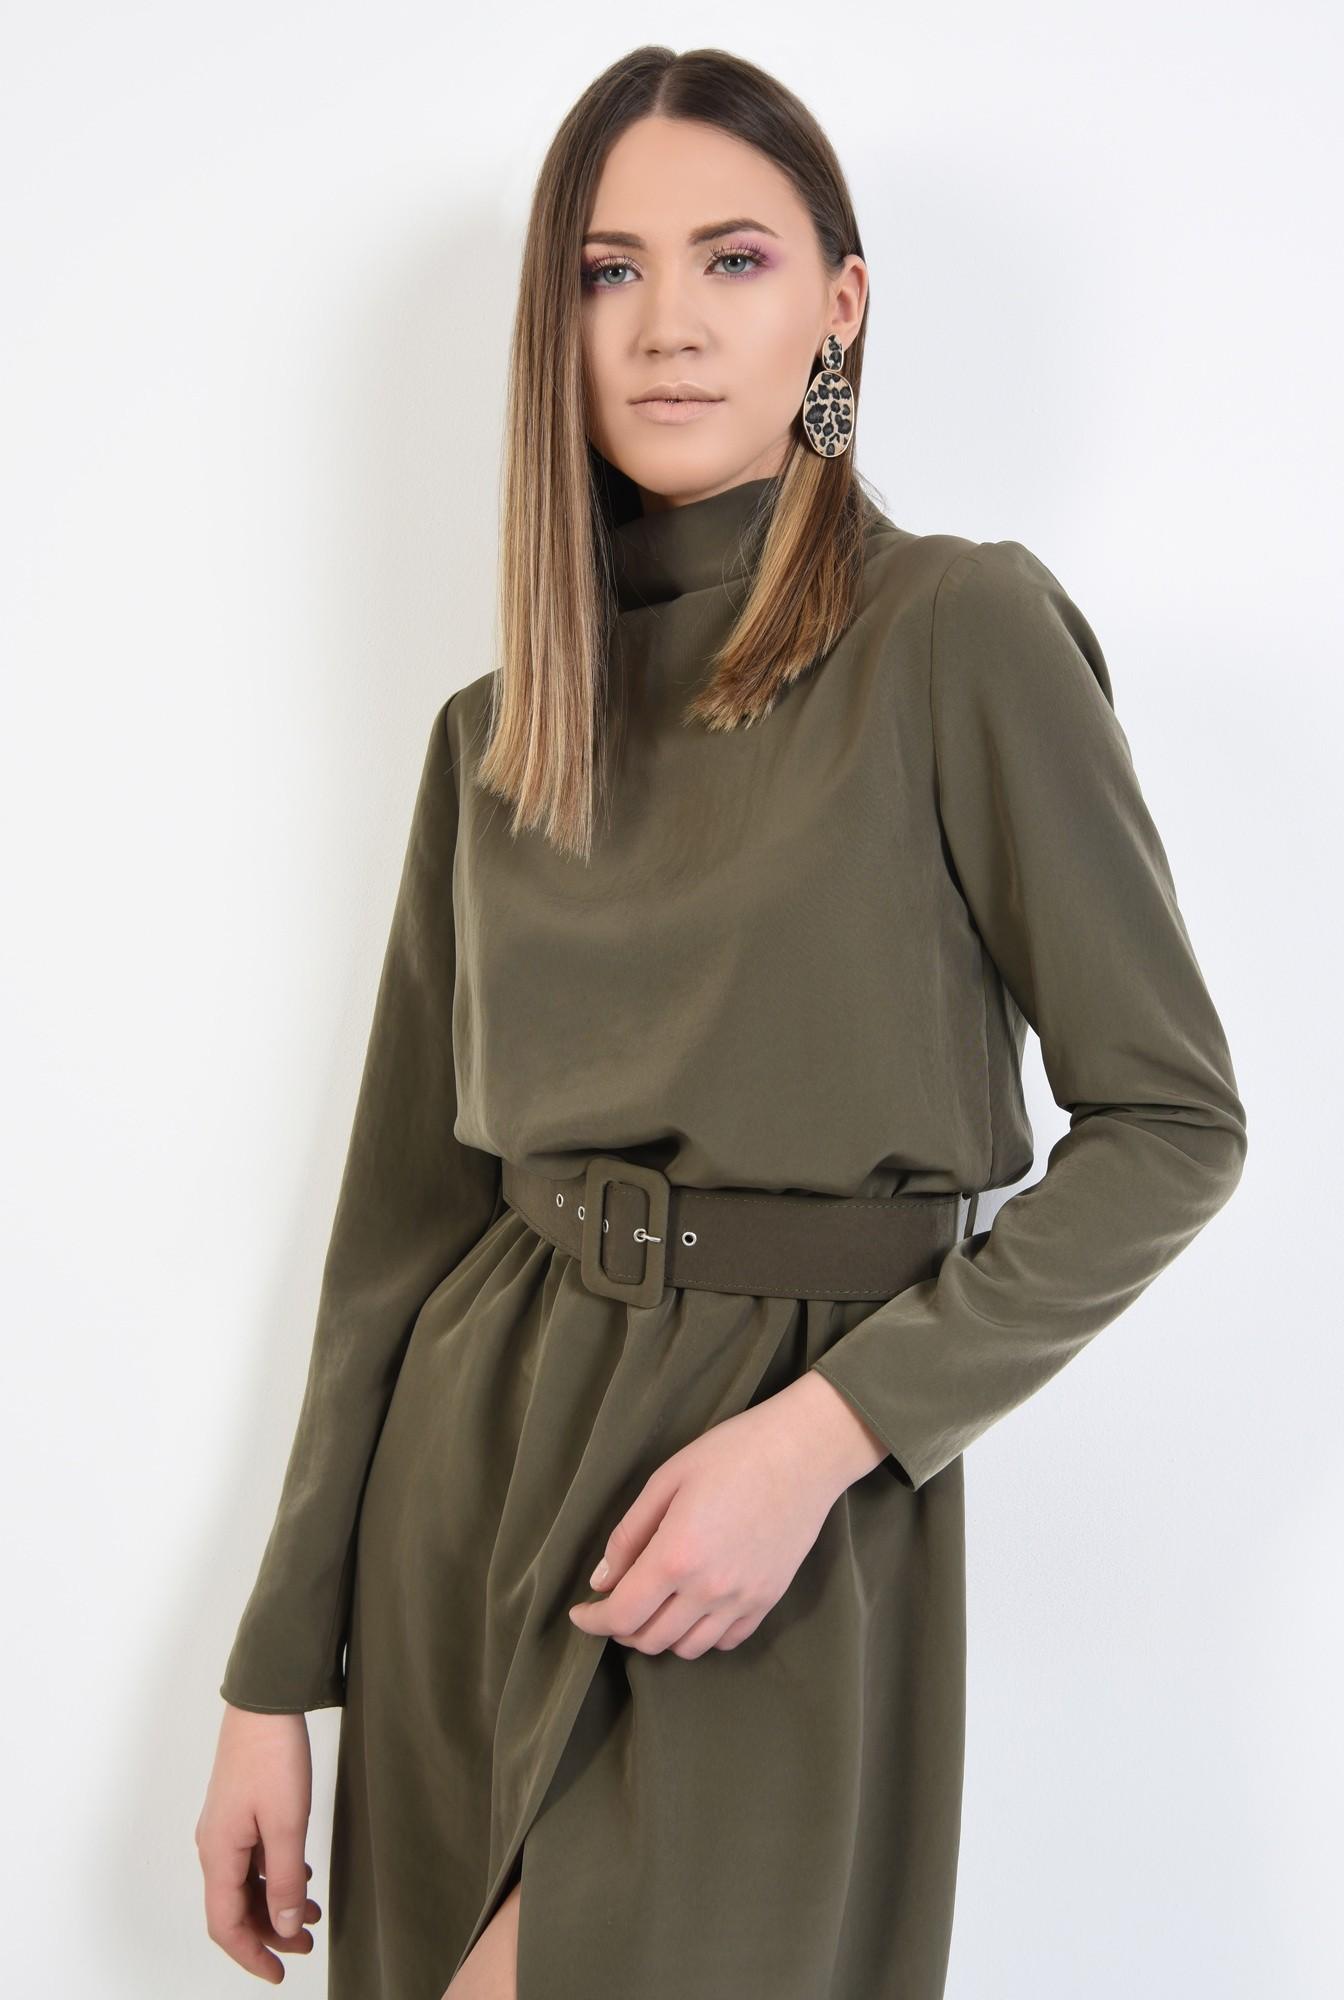 2 - rochie eleganta, de zi, verde, kaki, cu curea, maneci lungi